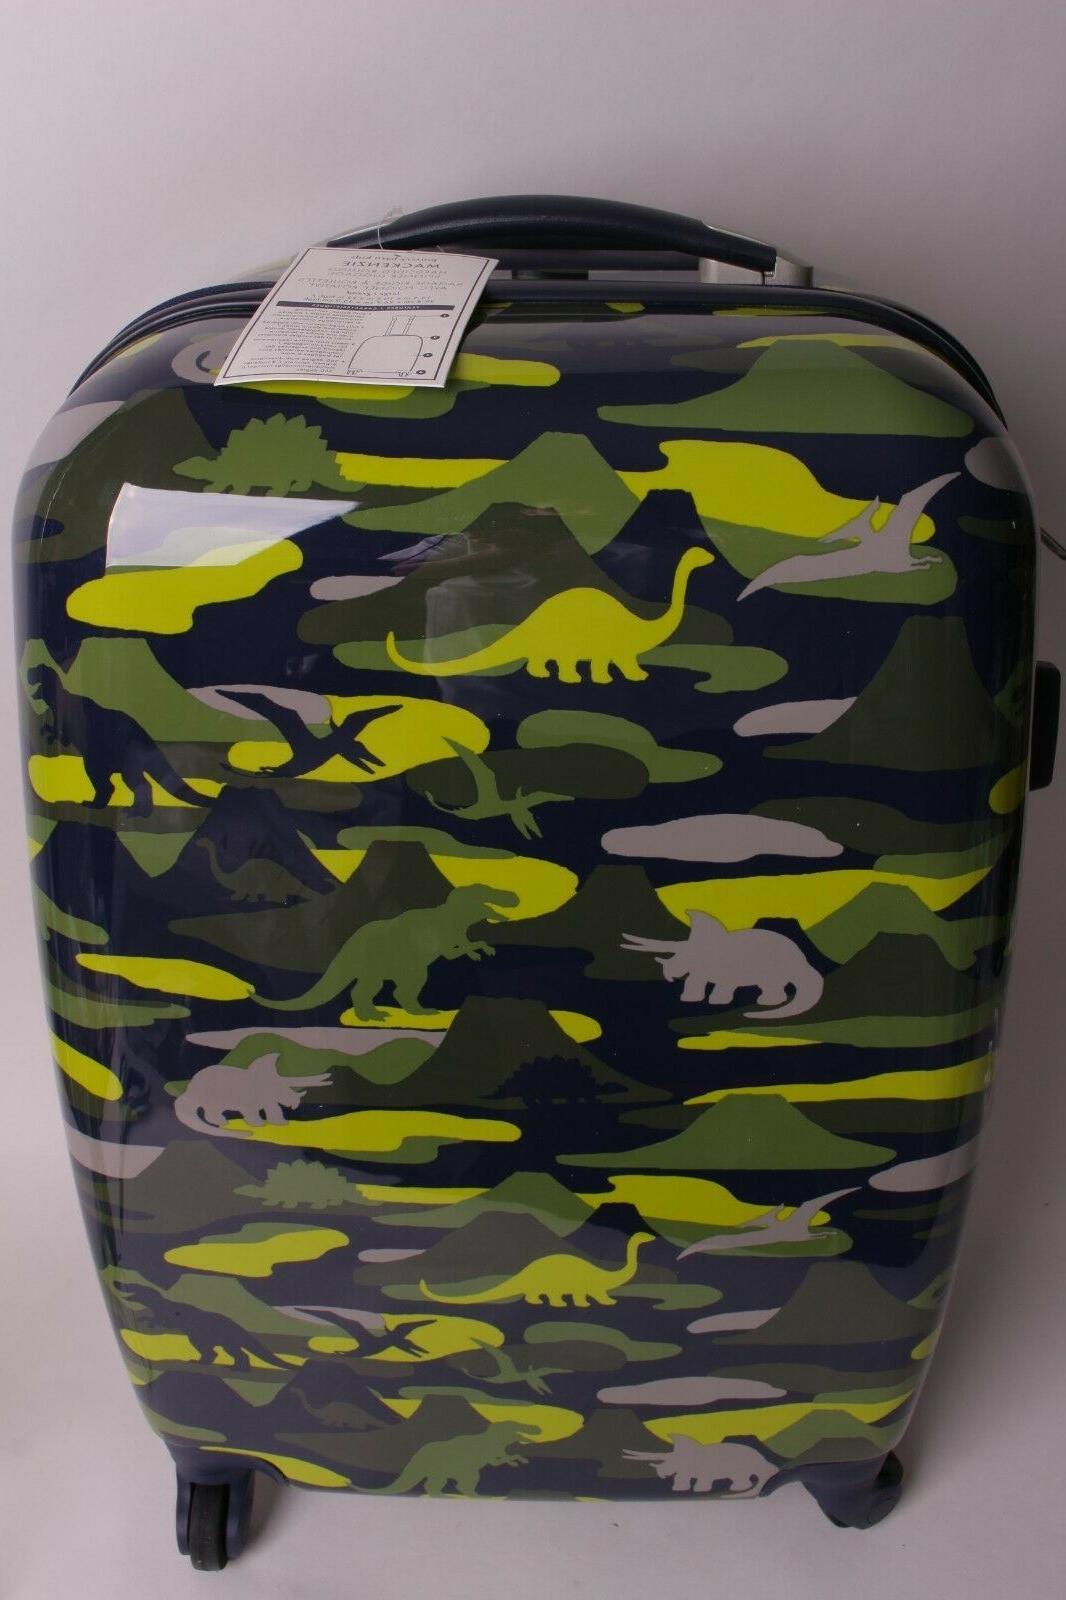 mackenzie spinner luggage large suitcase green camo